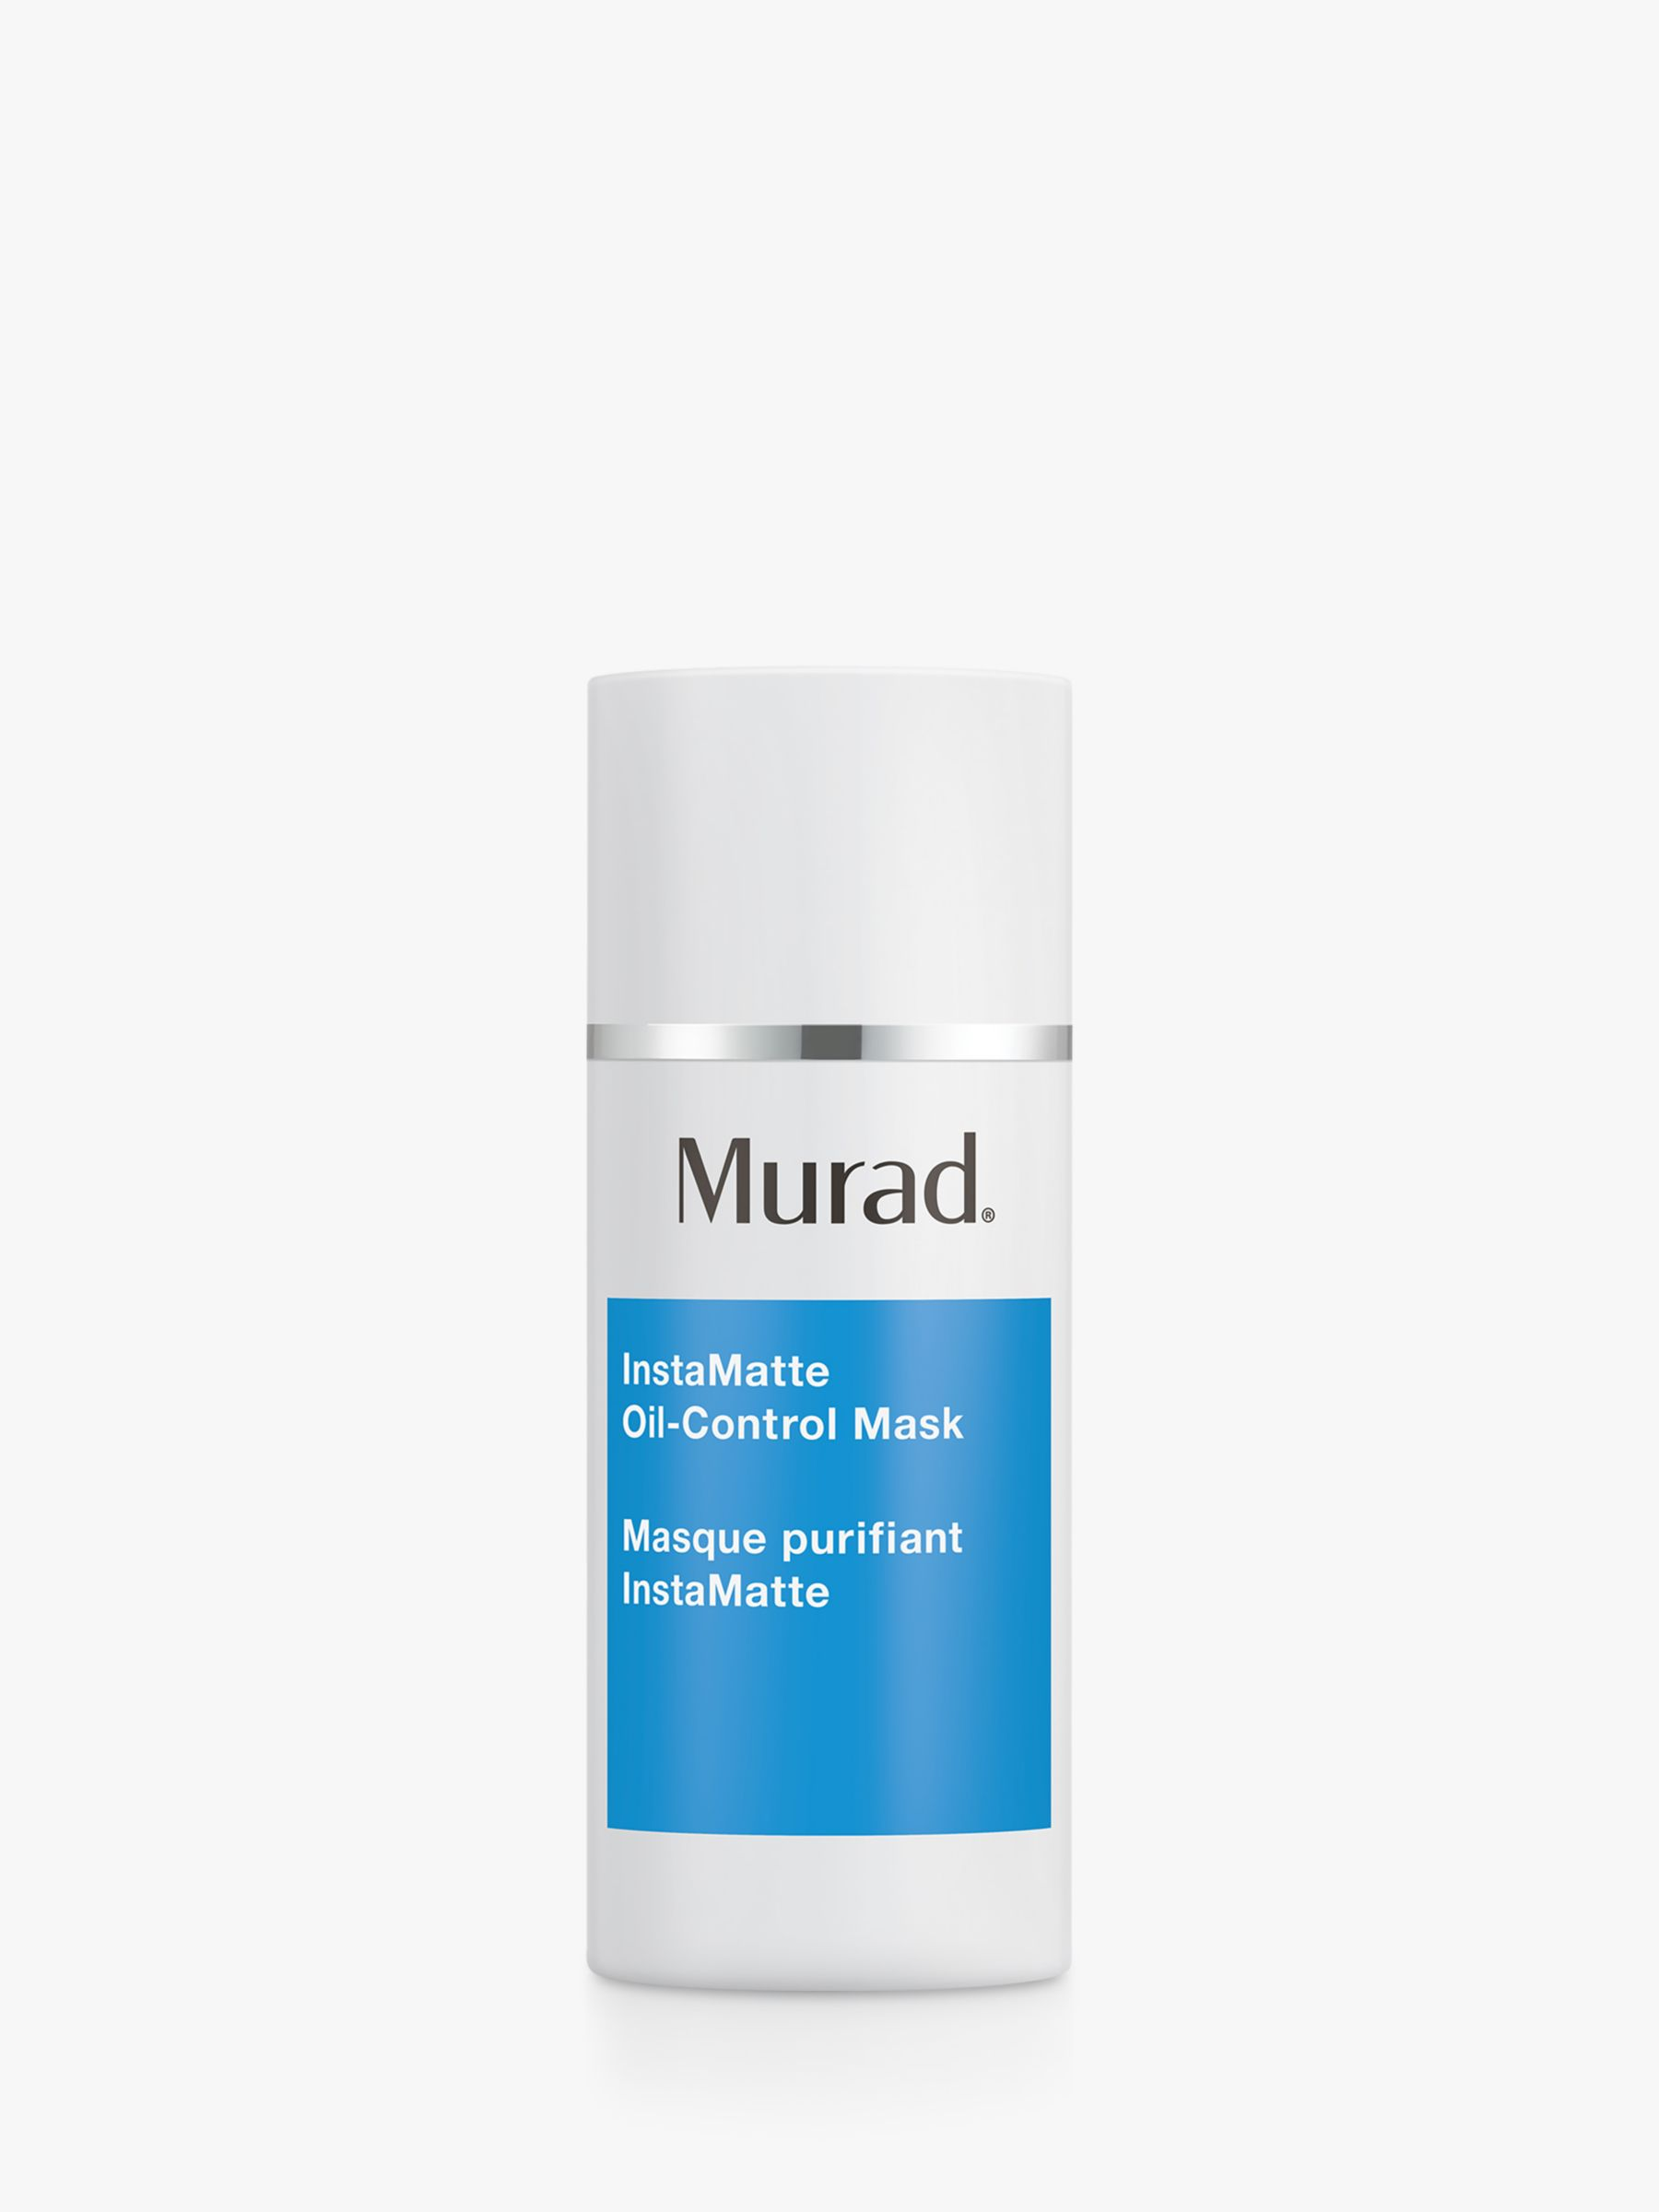 Murad Murad Instamatte Oil-Control Mask, 100ml